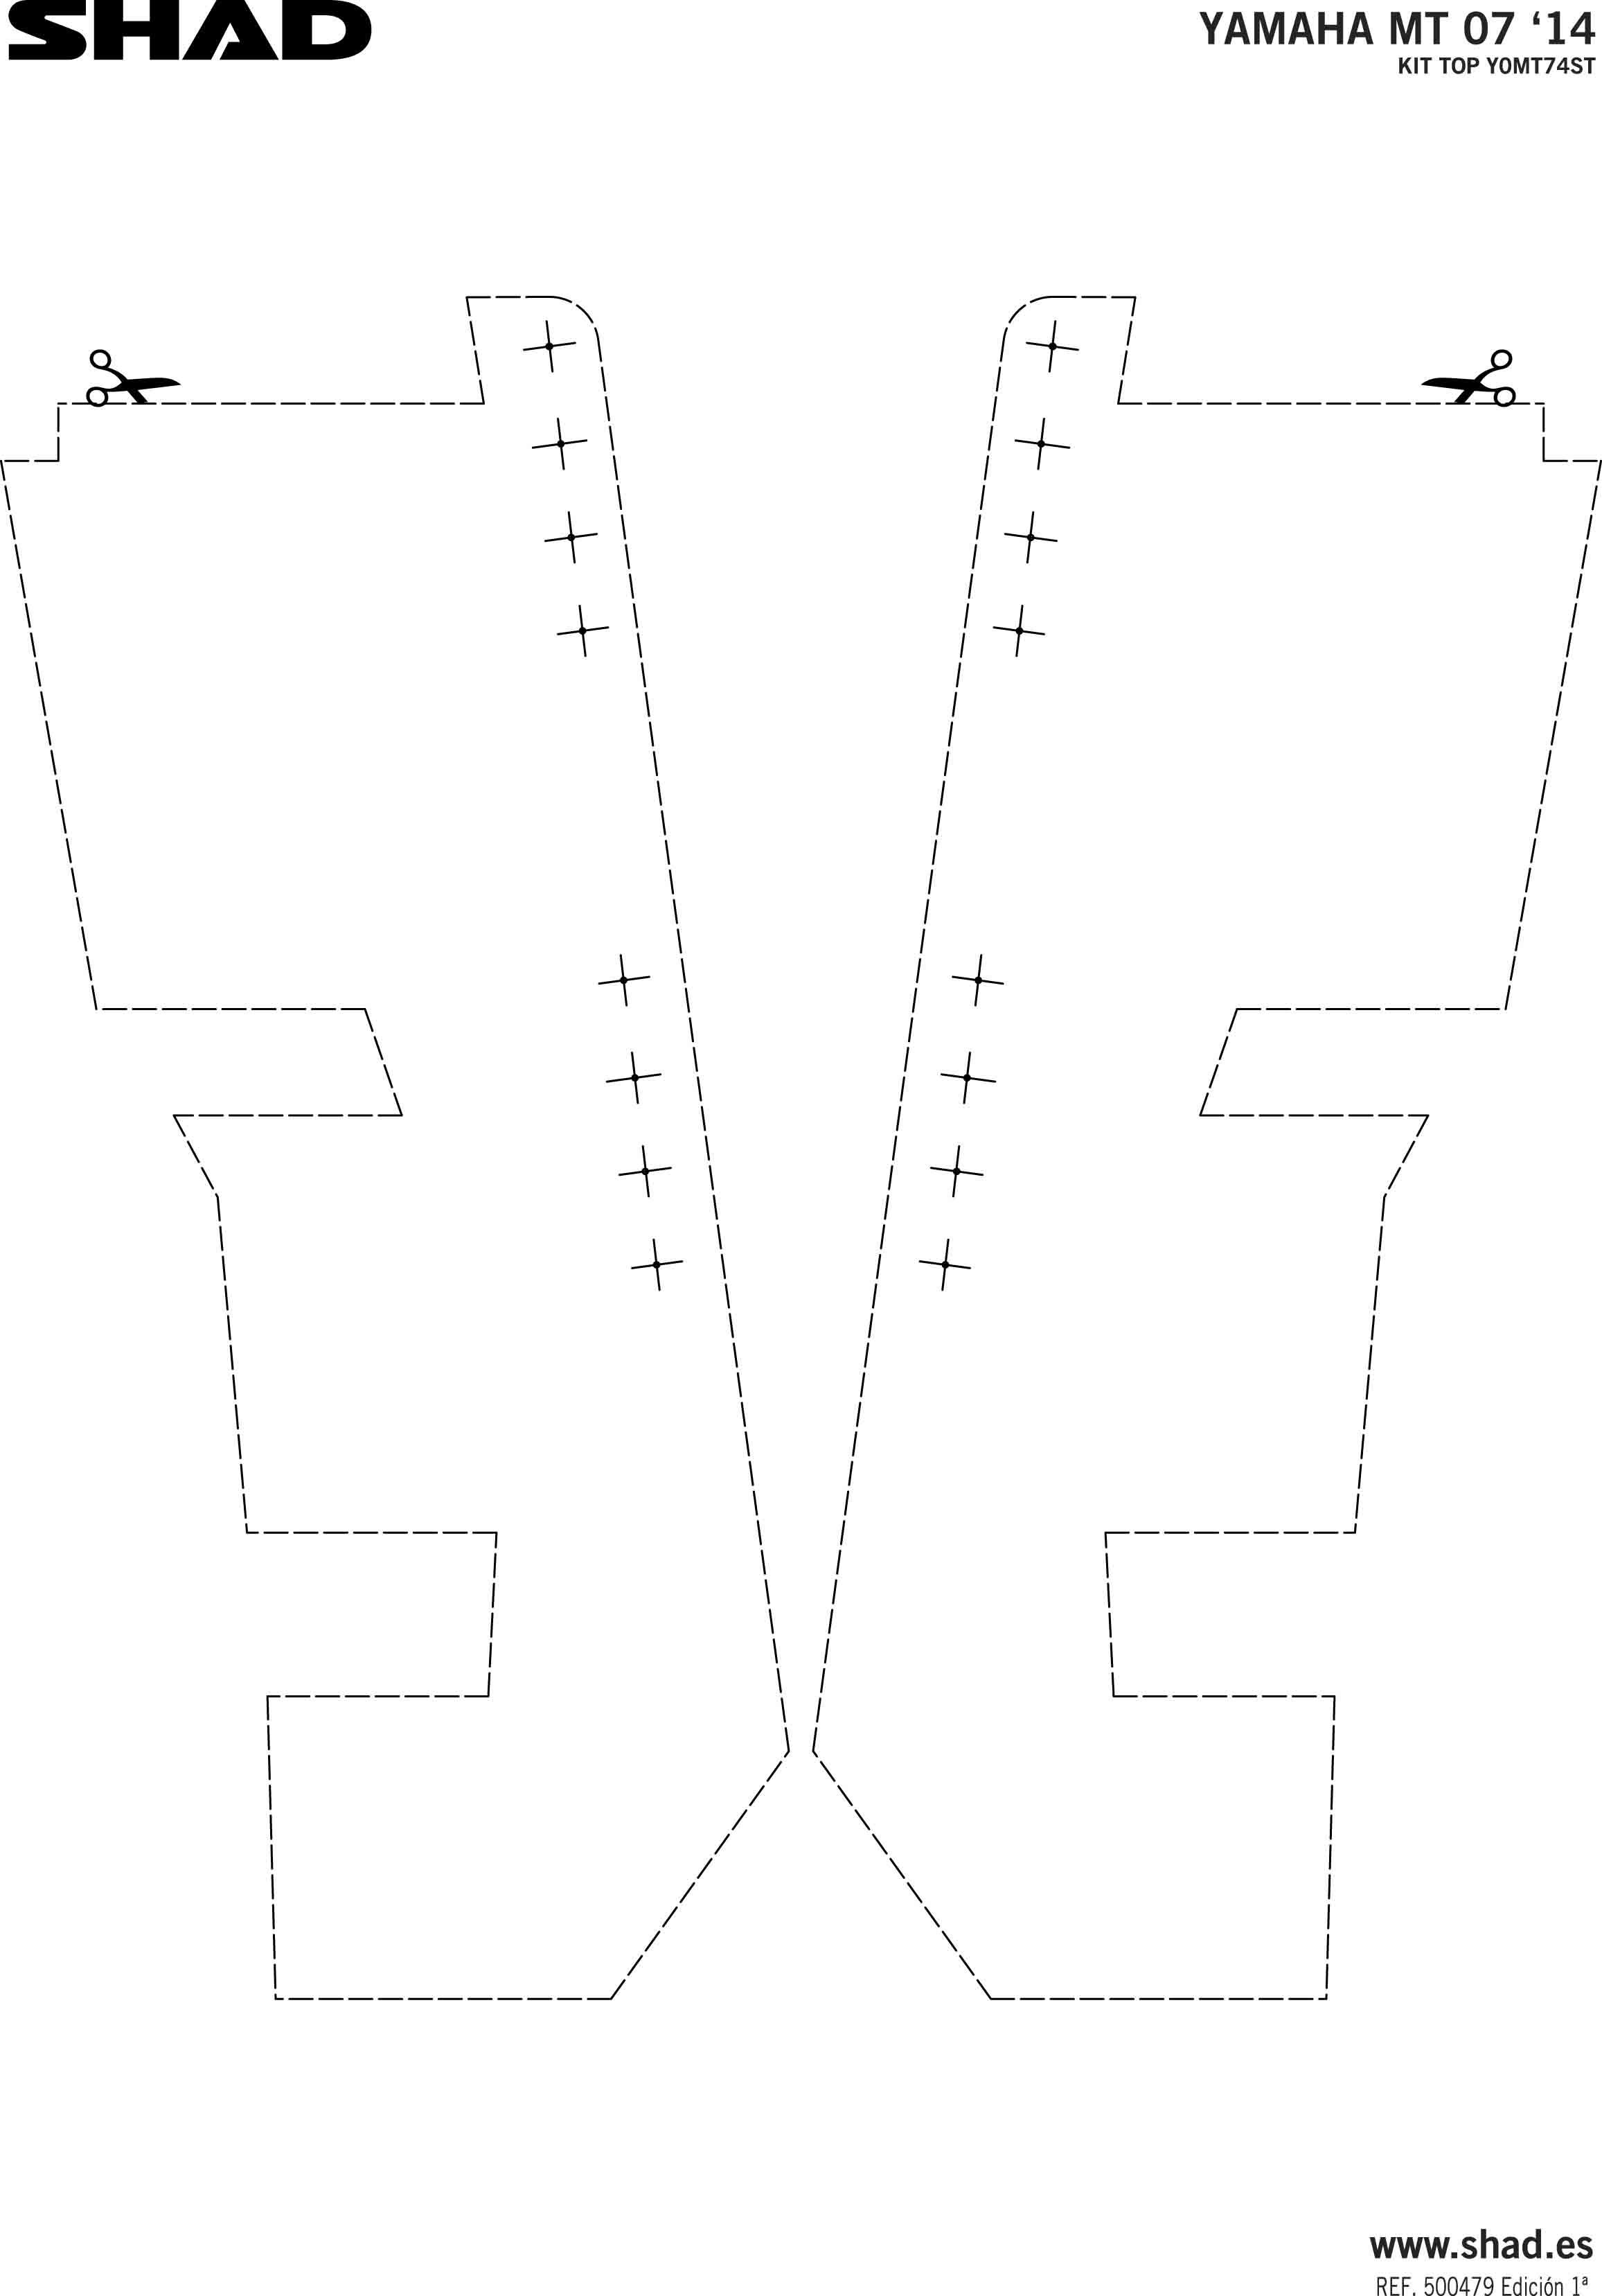 Shad Top Case Rack Yamaha Fz 07